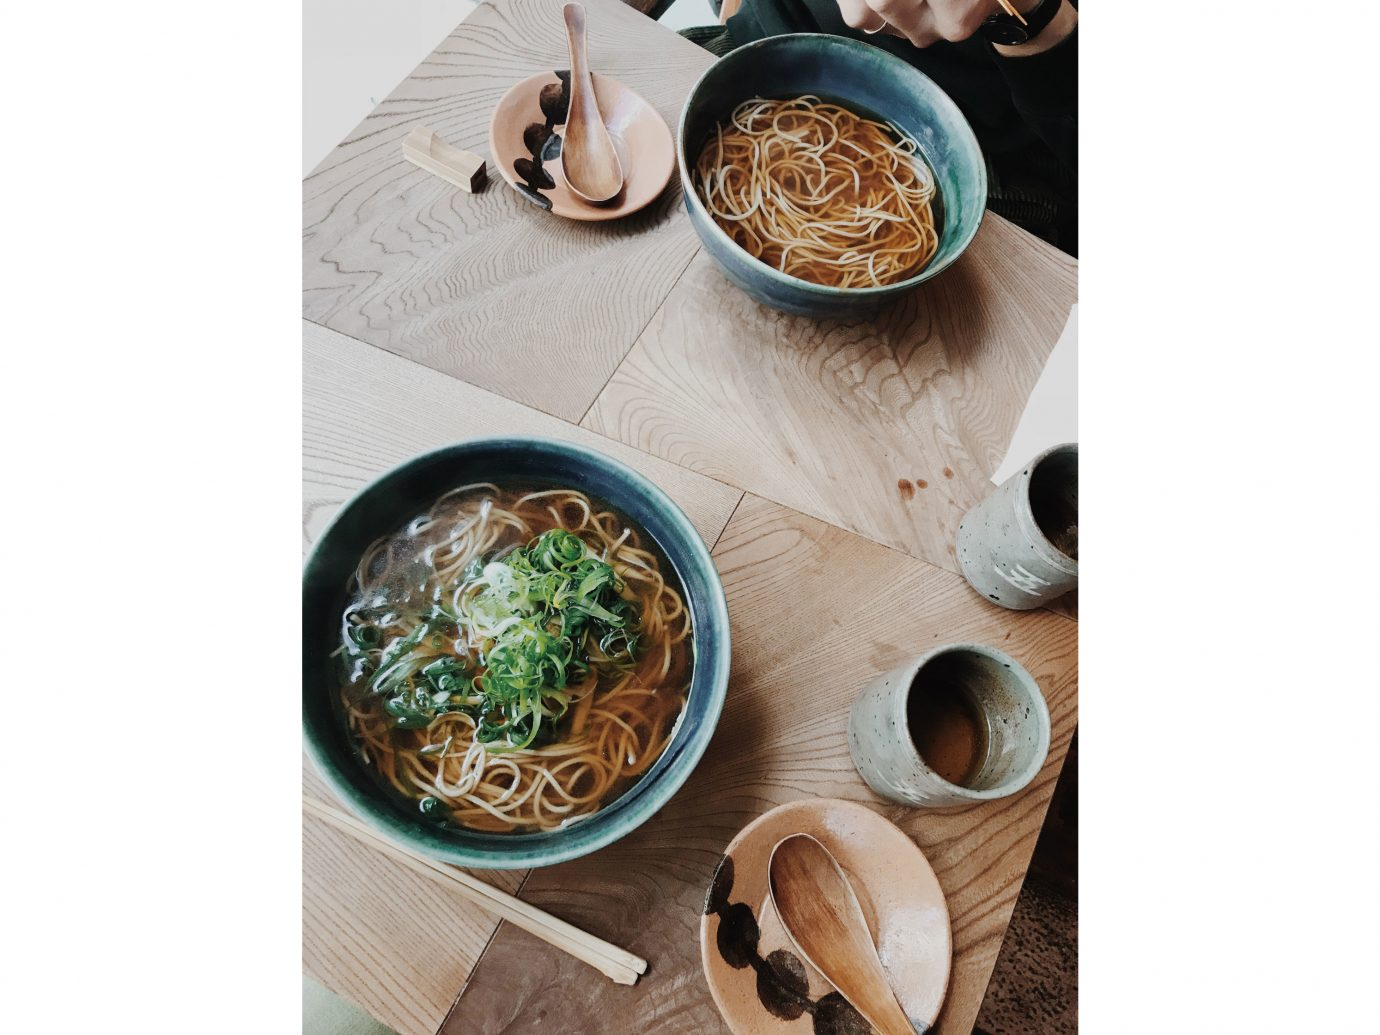 Influencers + Tastemakers Japan Photo Diary Tokyo food dish tableware cuisine ingredient different recipe soba vegetarian food asian food meal